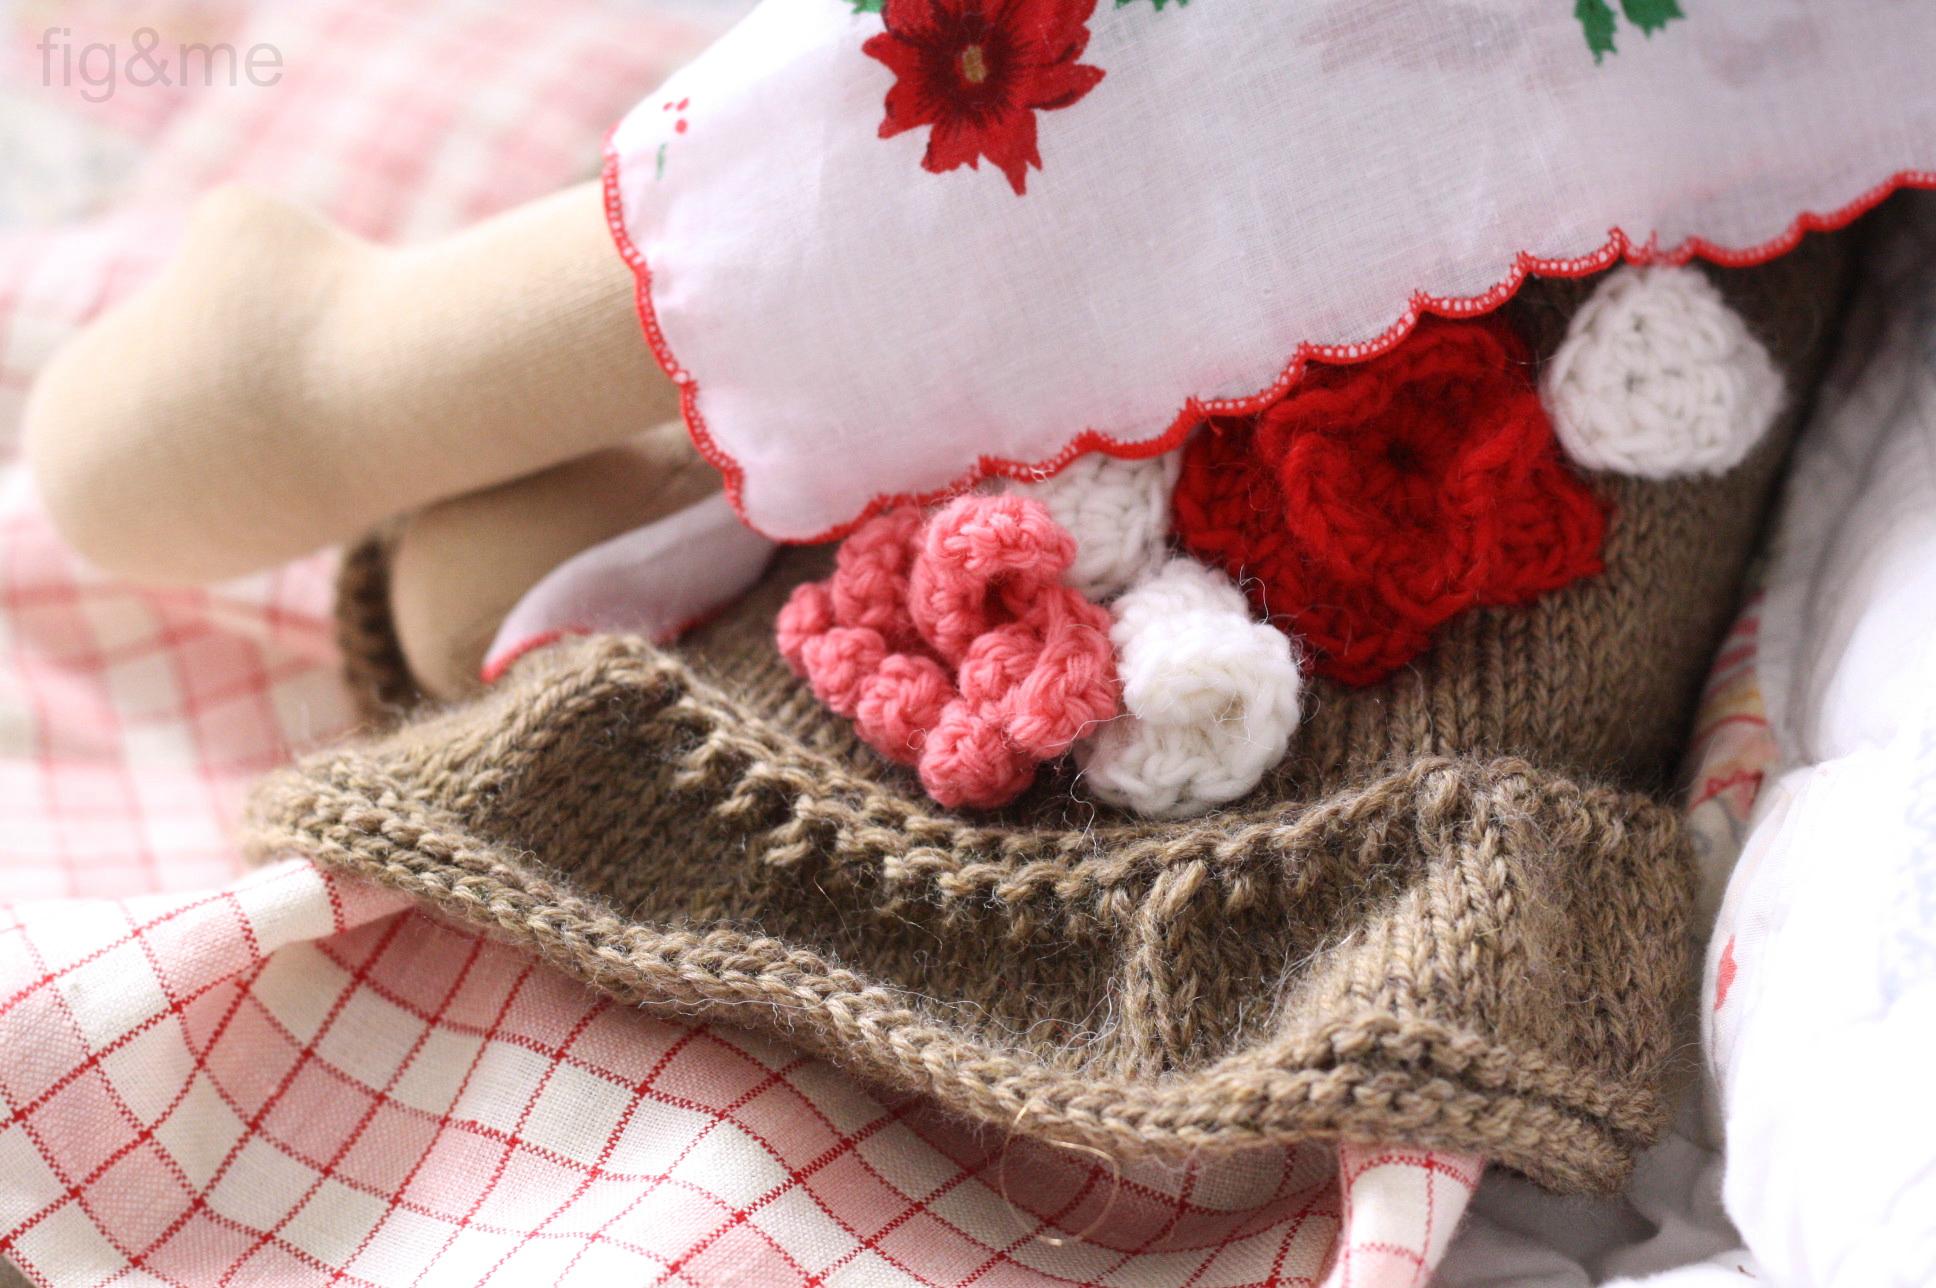 CrochetFlowers-byFigandMe.jpg